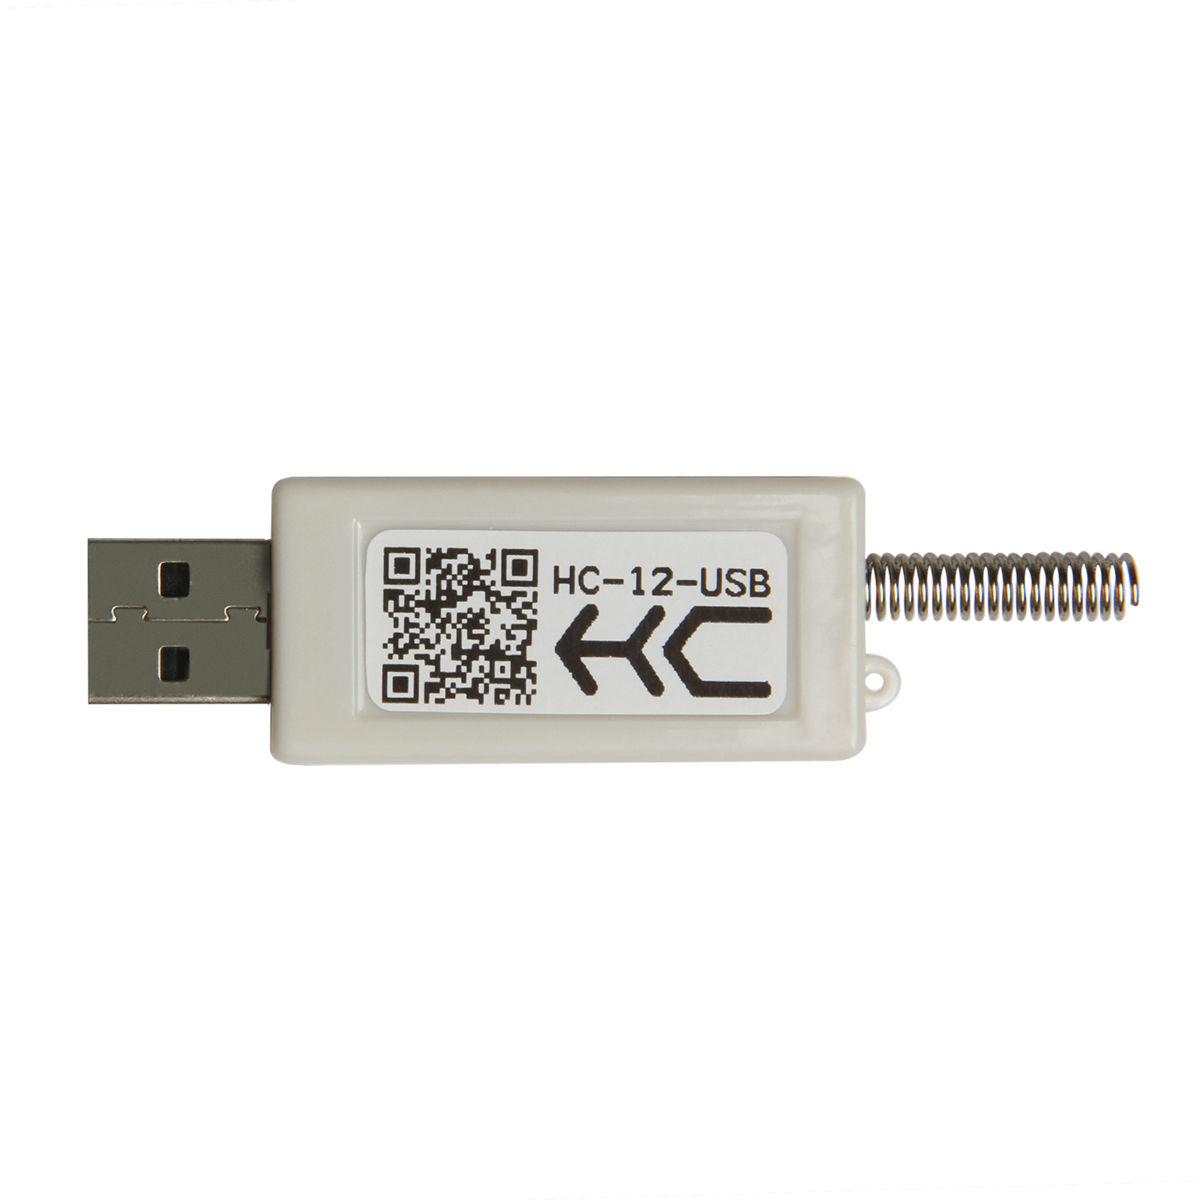 Hc cc usb si mhz wireless serial port module